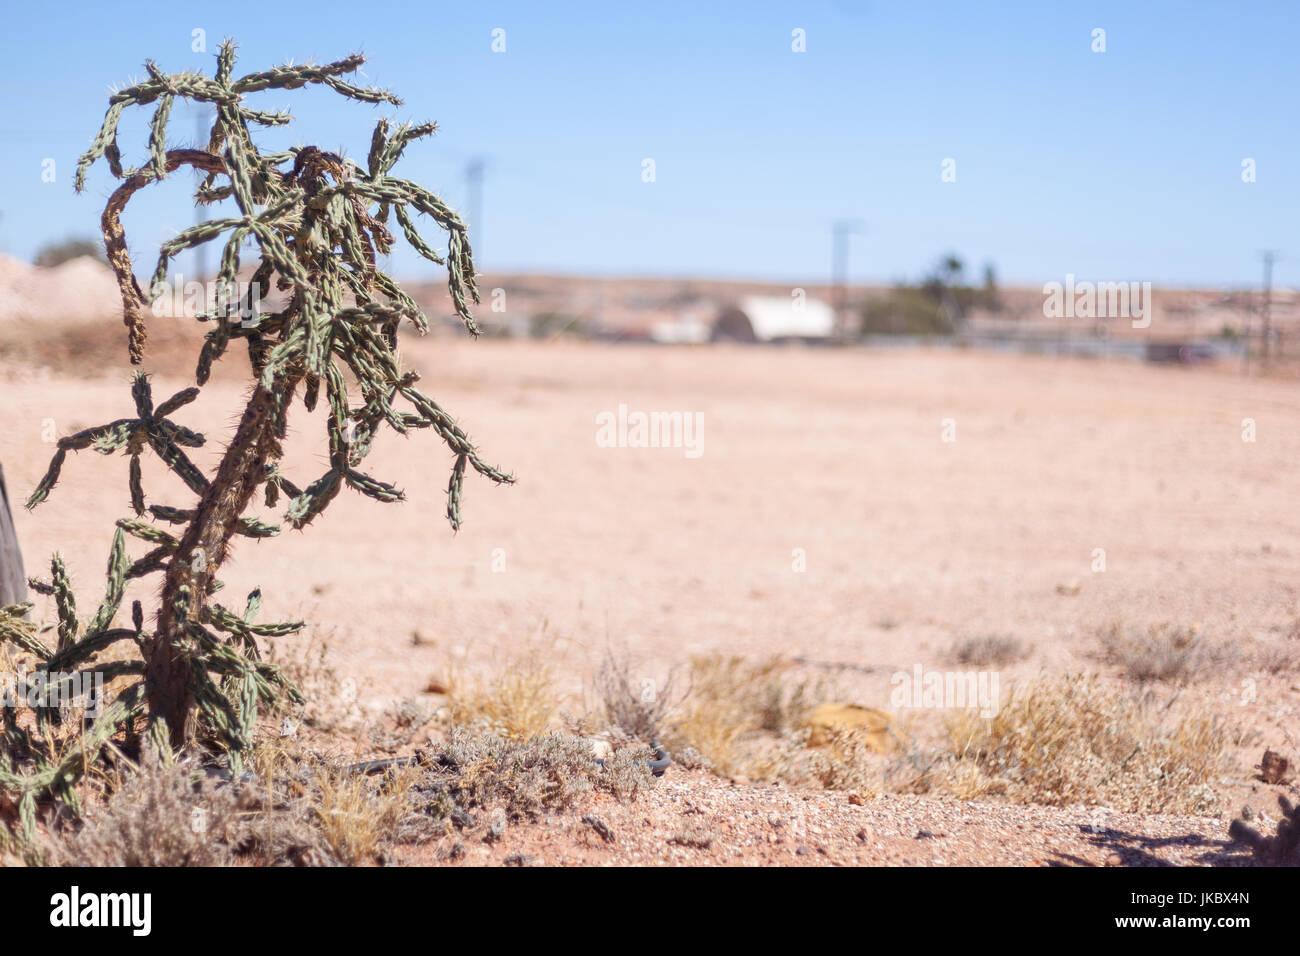 Colorado Buckhorn Cholla Cactus, an invasive plant in the Australian Outback Stock Photo